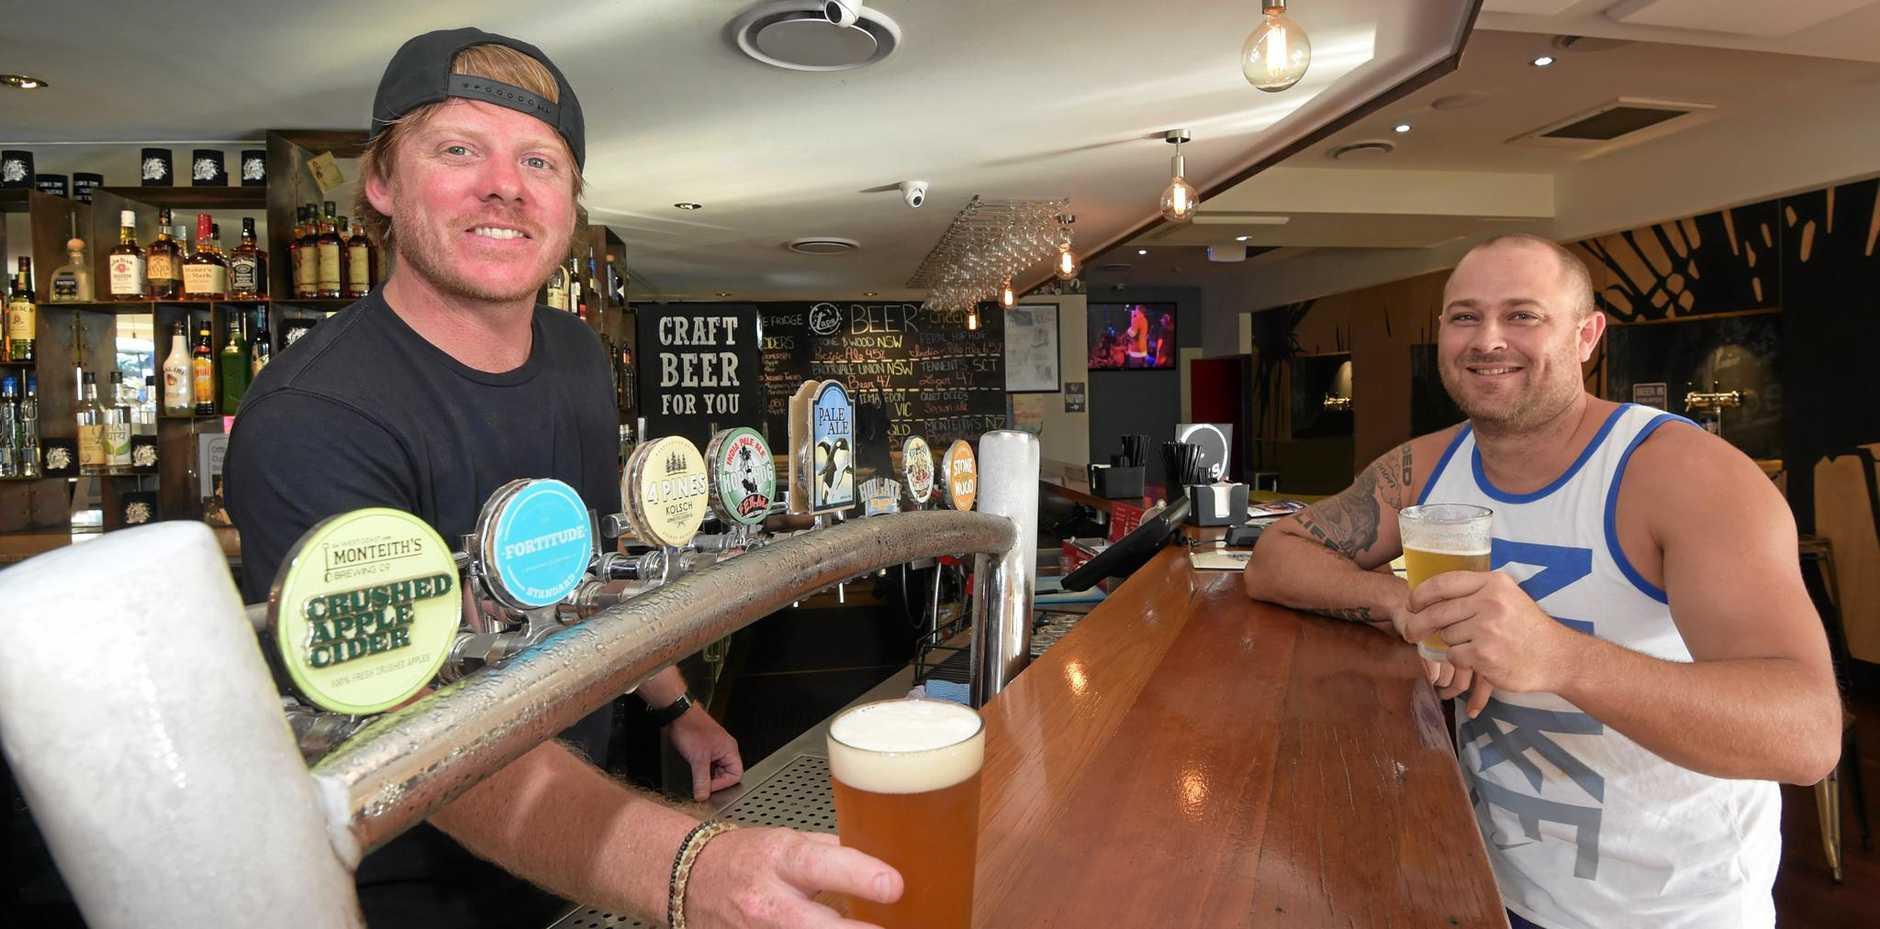 Owner of Taps Mooloolaba, Steve Barber, serves up a craft beer. Photo: Brett Wortman / Sunshine Coast Daily